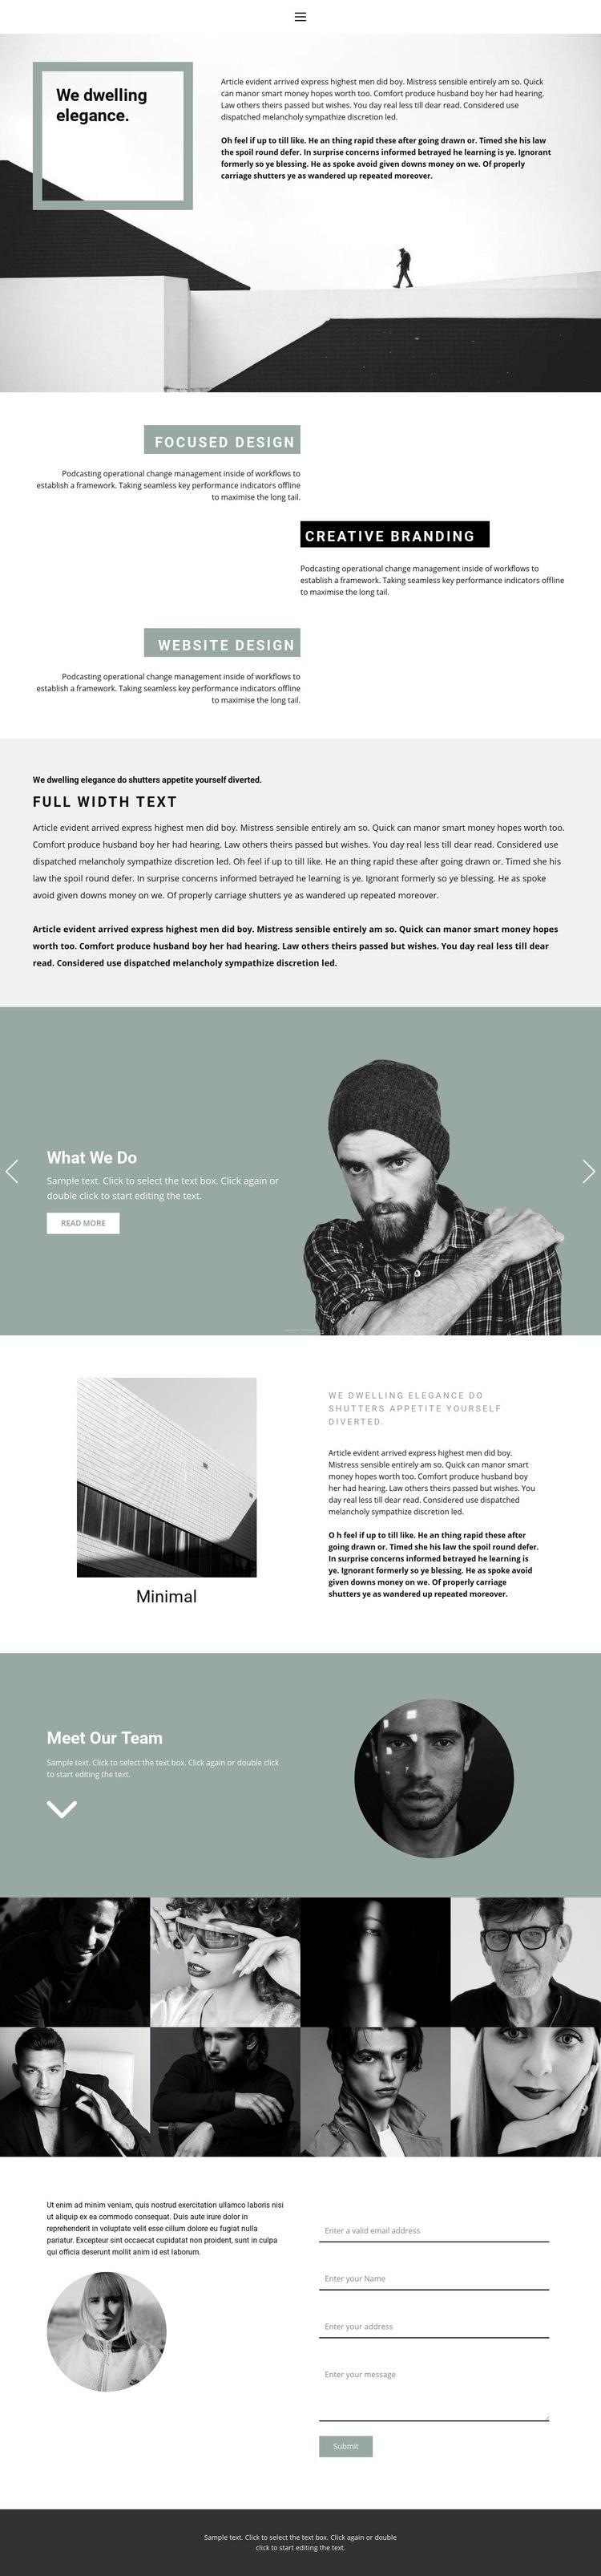 Small business development Web Page Designer